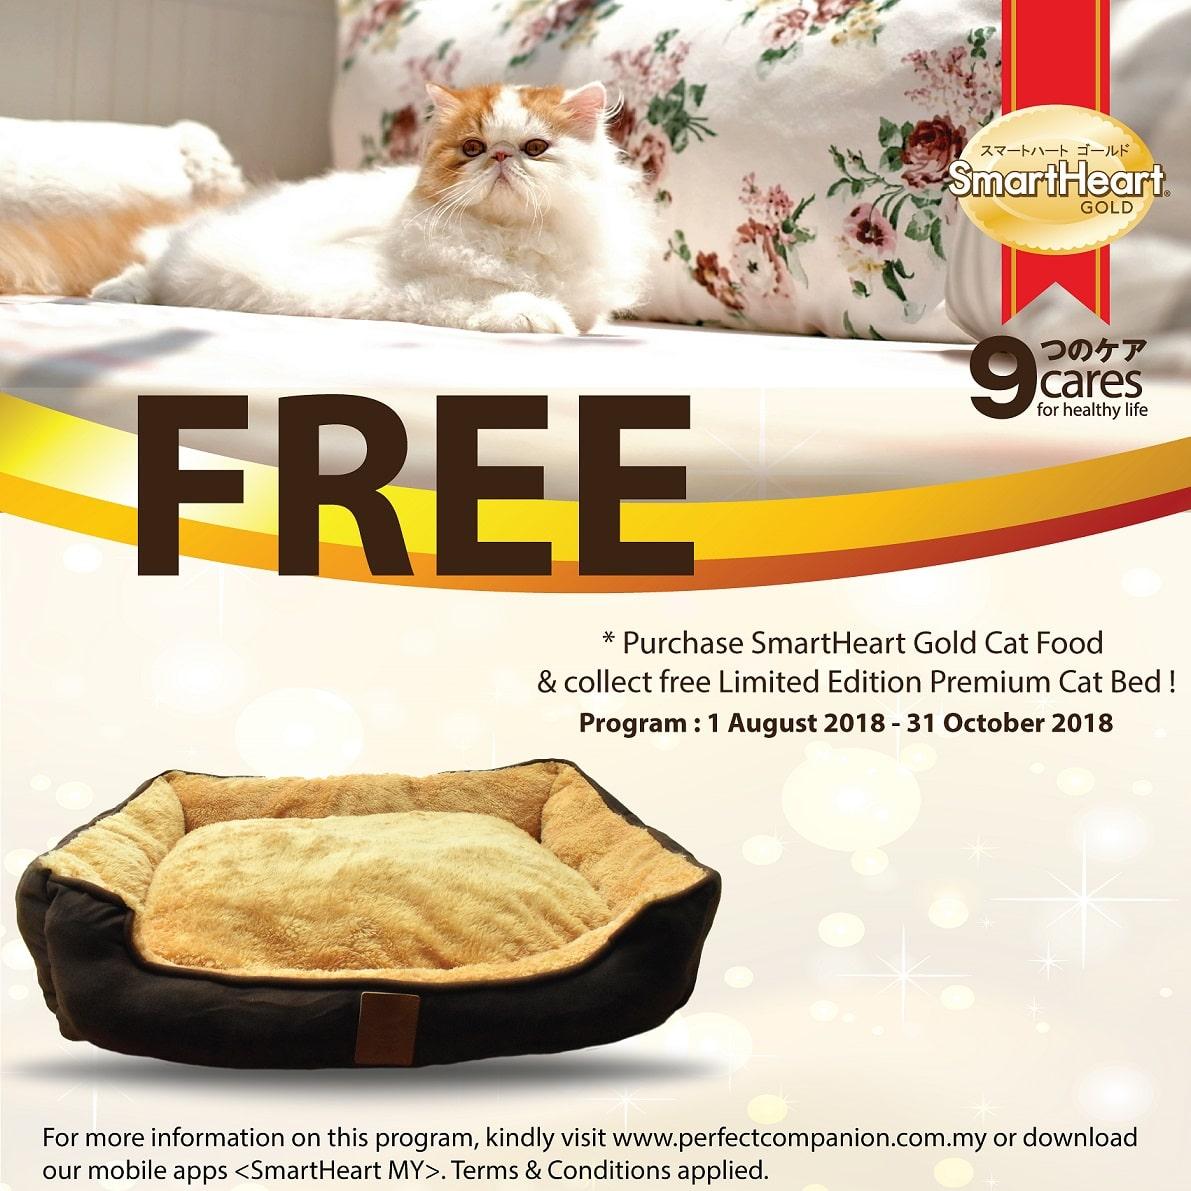 SmartHeart Gold Cat Bed Redemption Program (1 Aug – 31 Oct 2018)